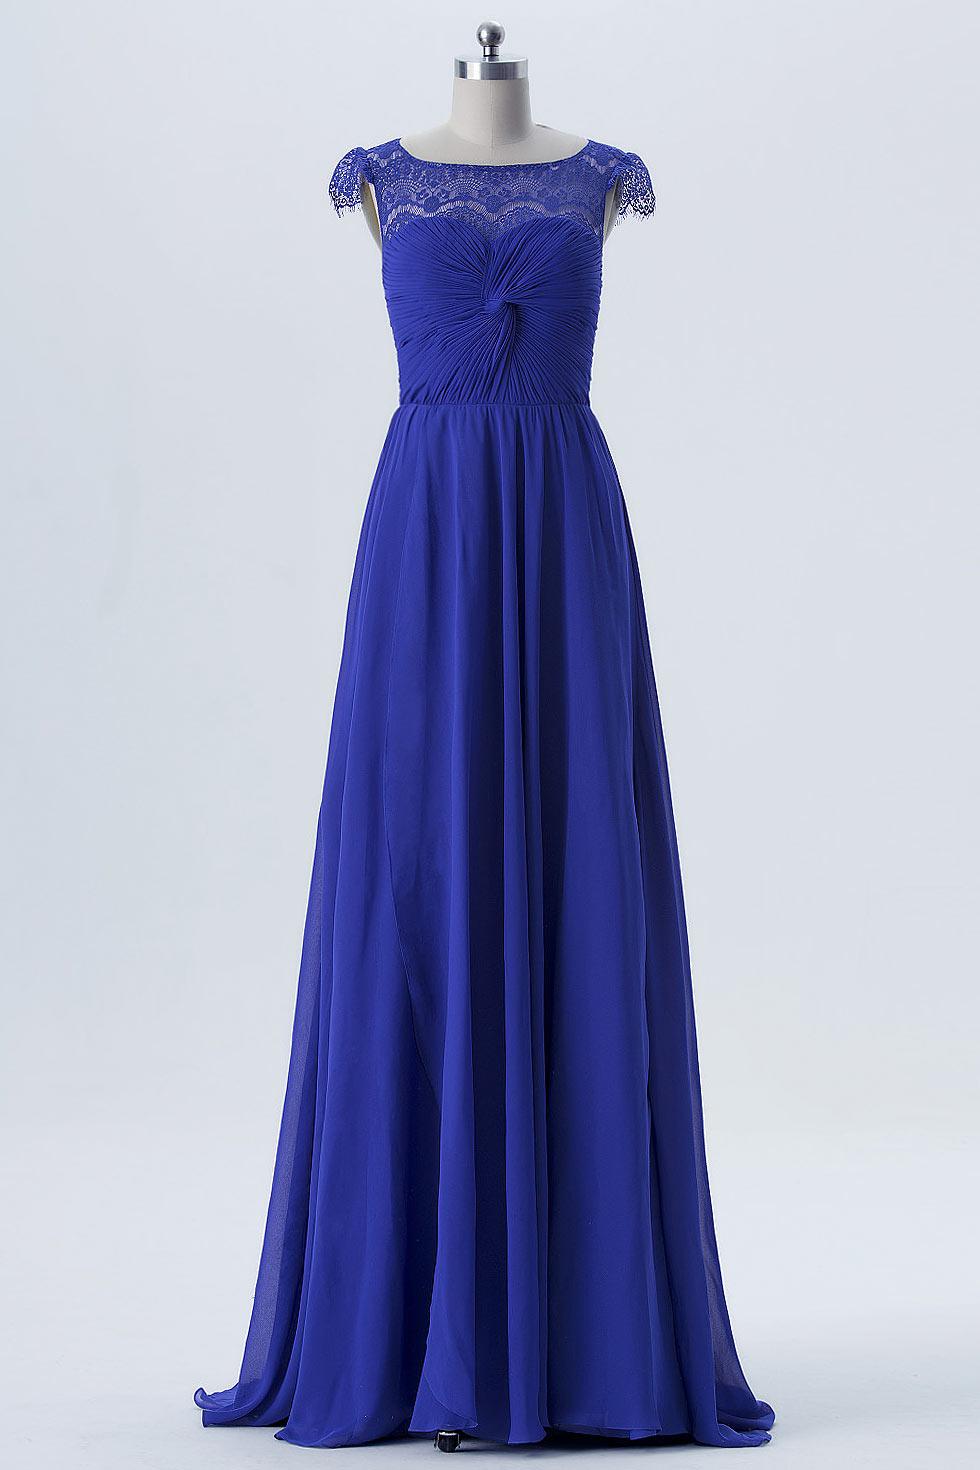 Robe de soirée bleu dentelle bustier plissé 2018